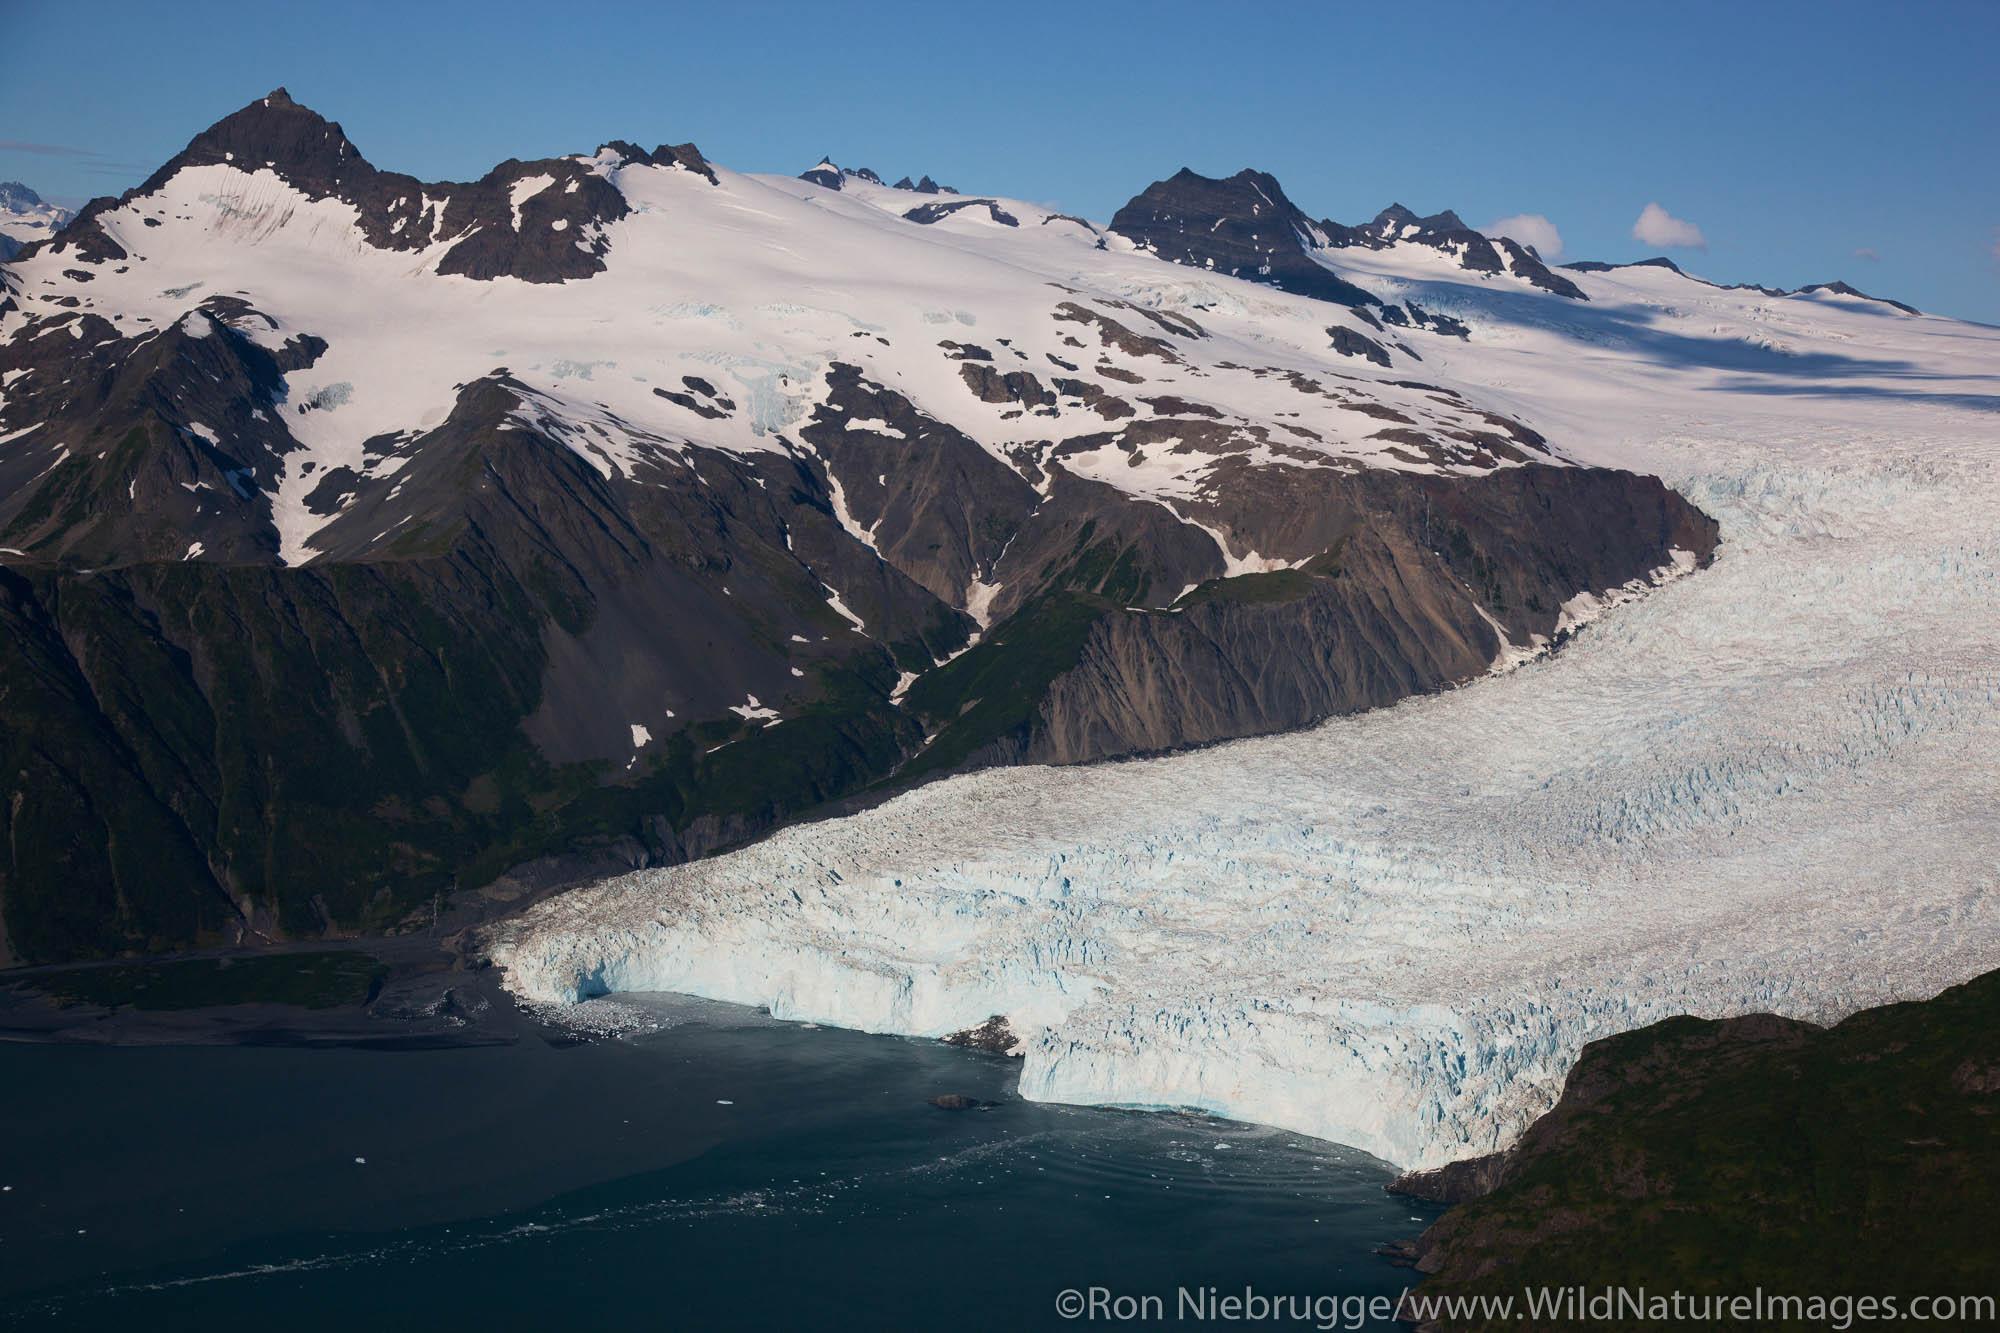 Aerial Kenai Fjords National Park, Aialik Glacier, near Seward, Alaska.